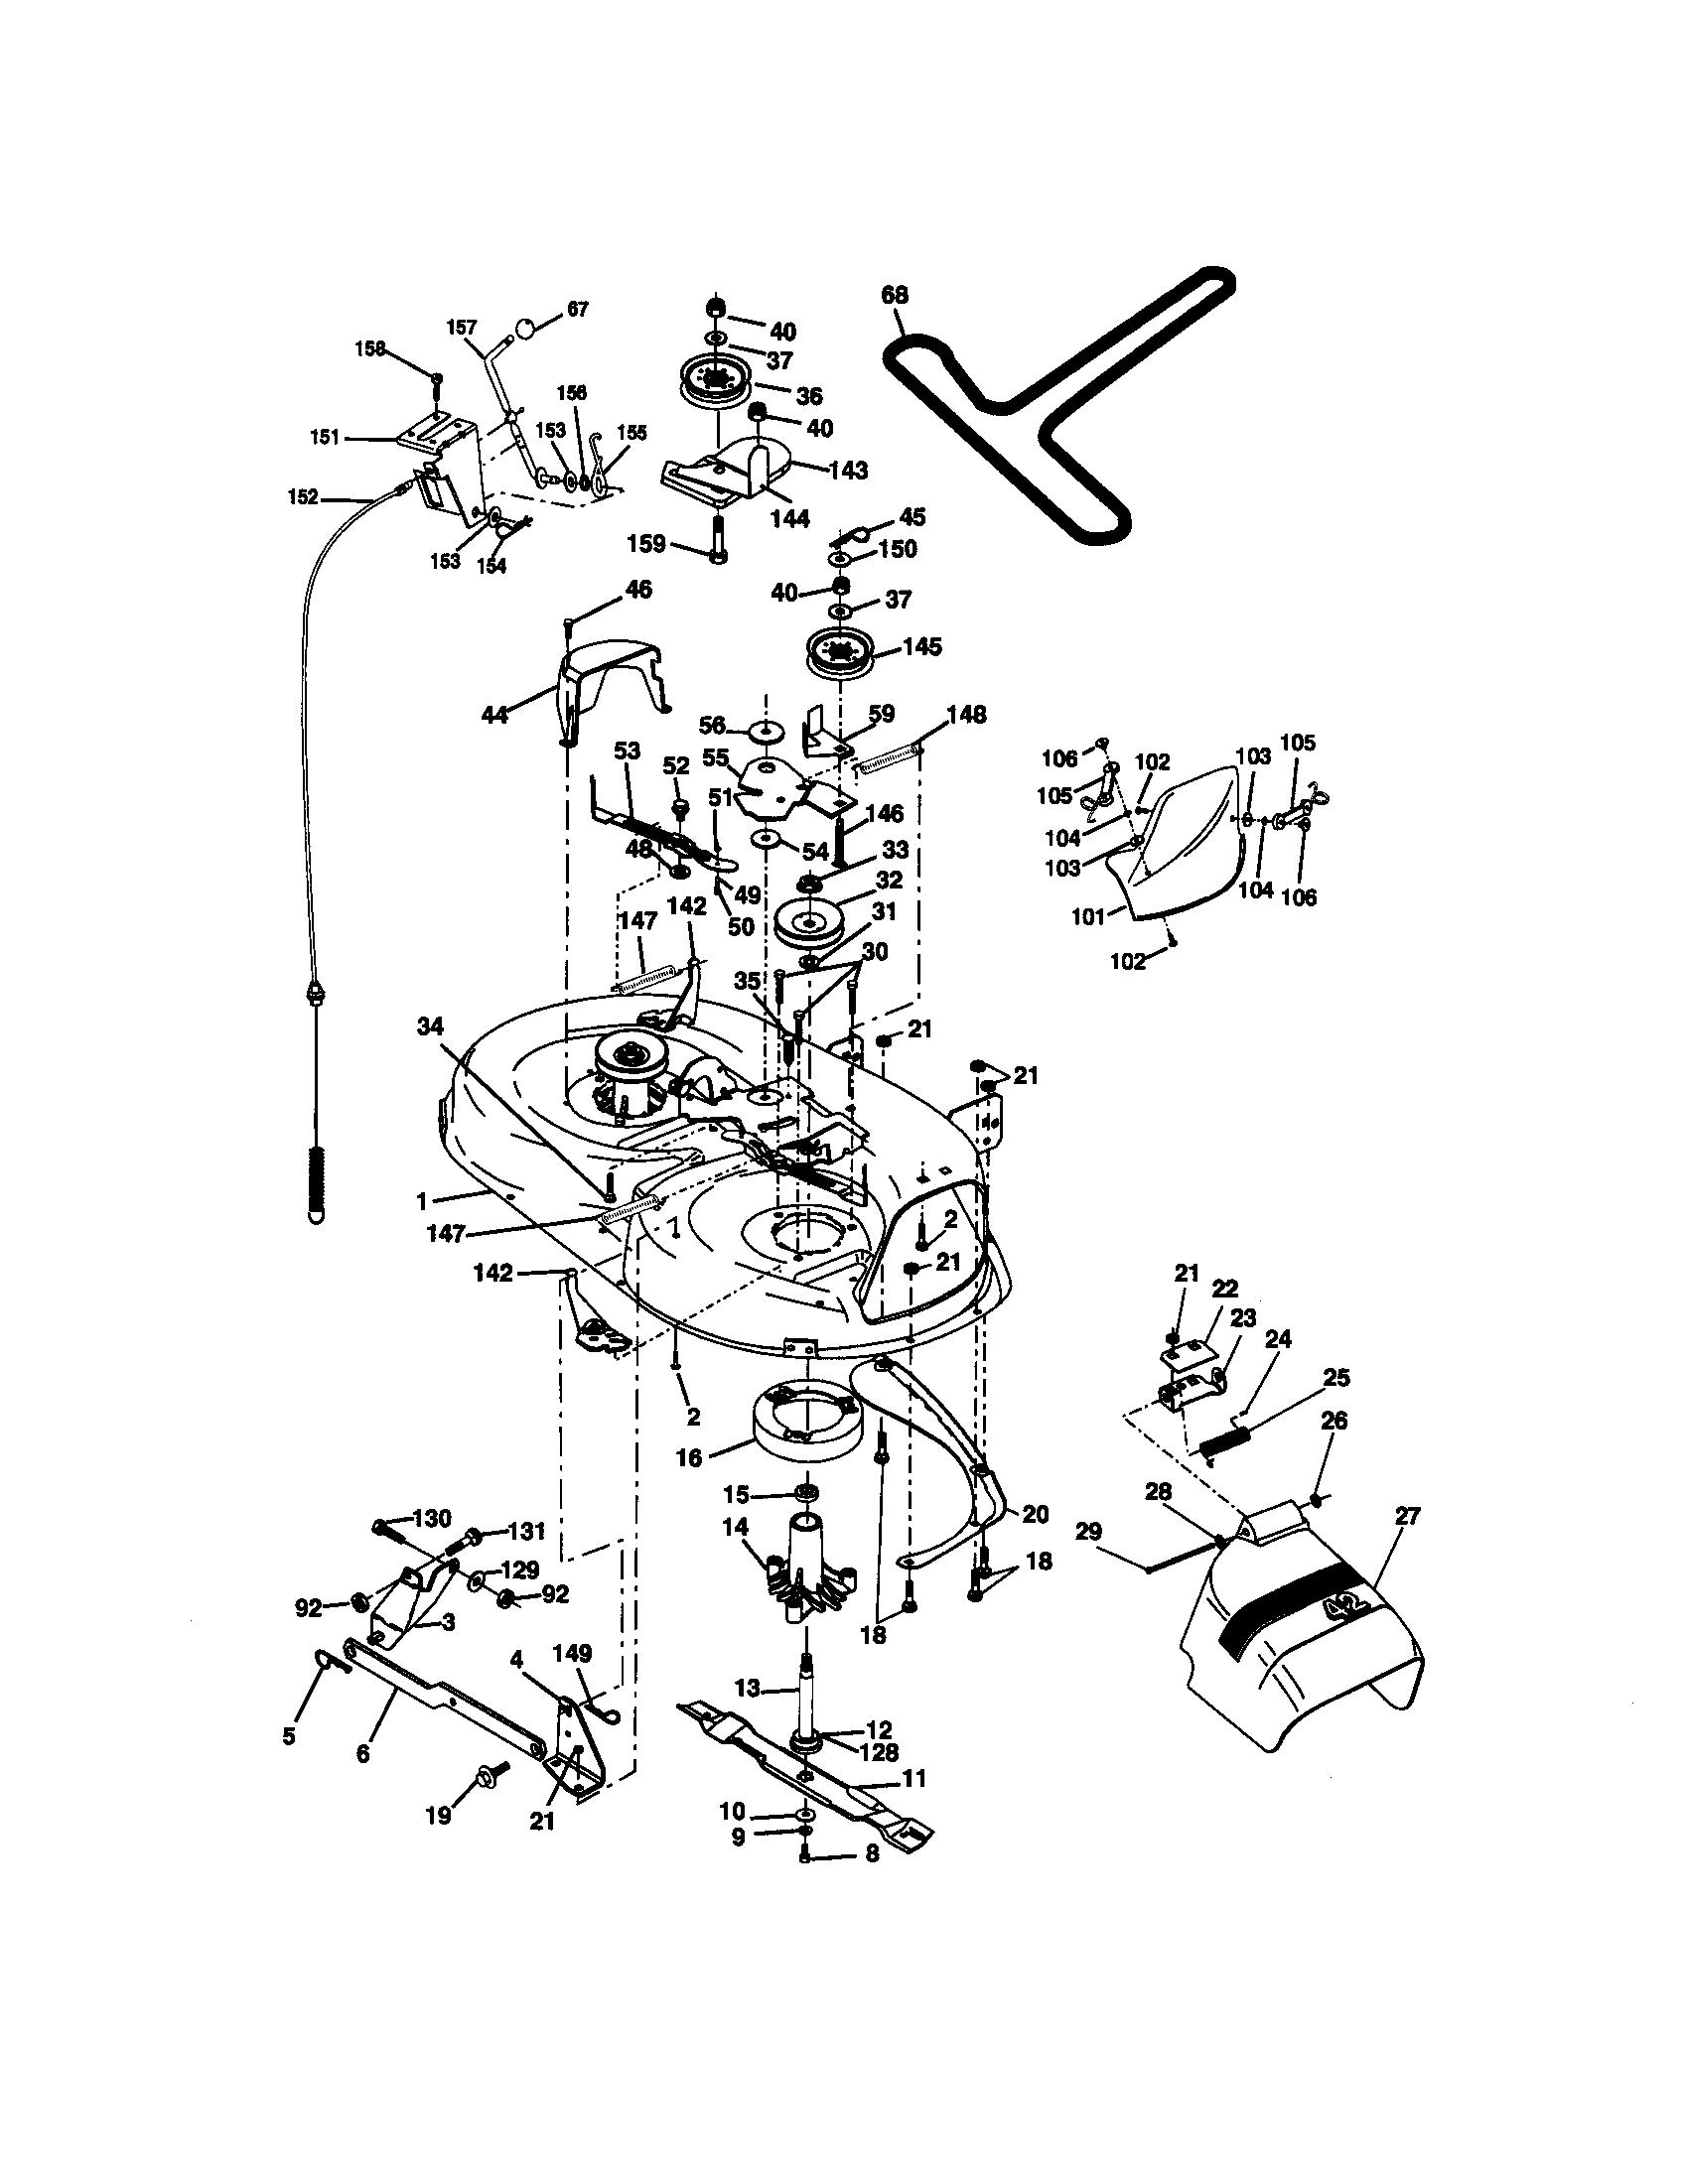 sear riding mower wiring diagram [ 1696 x 2200 Pixel ]